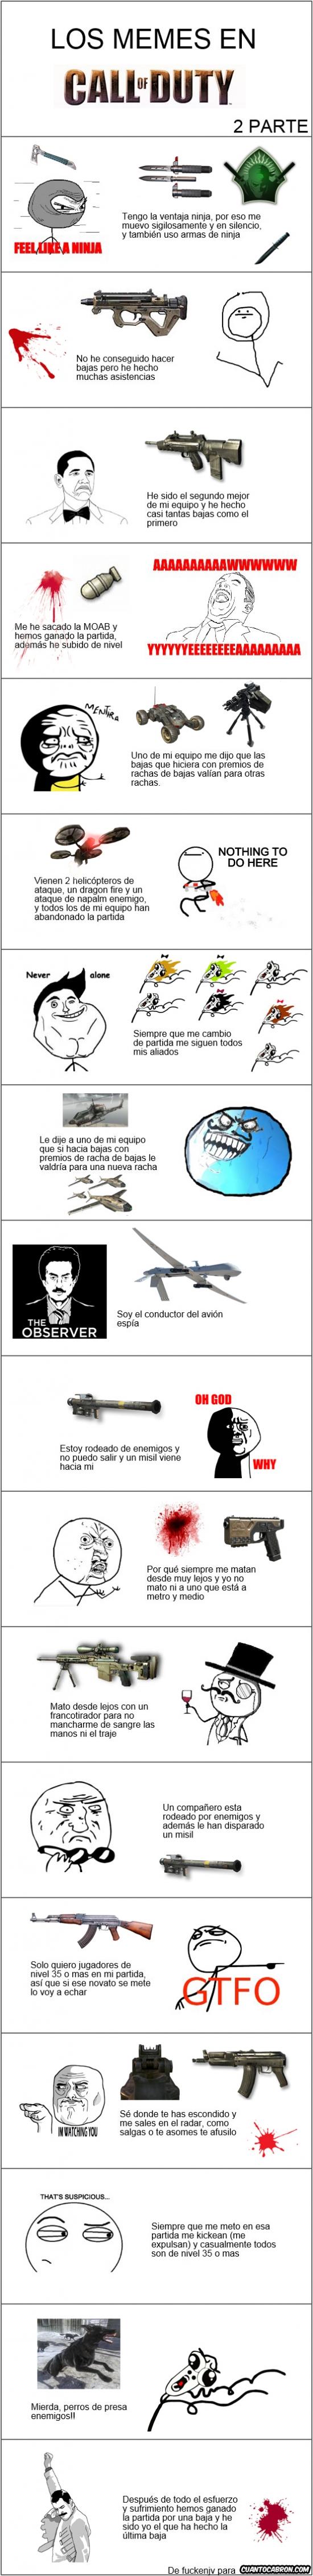 Mix - Los memes en Call of Duty, parte 2